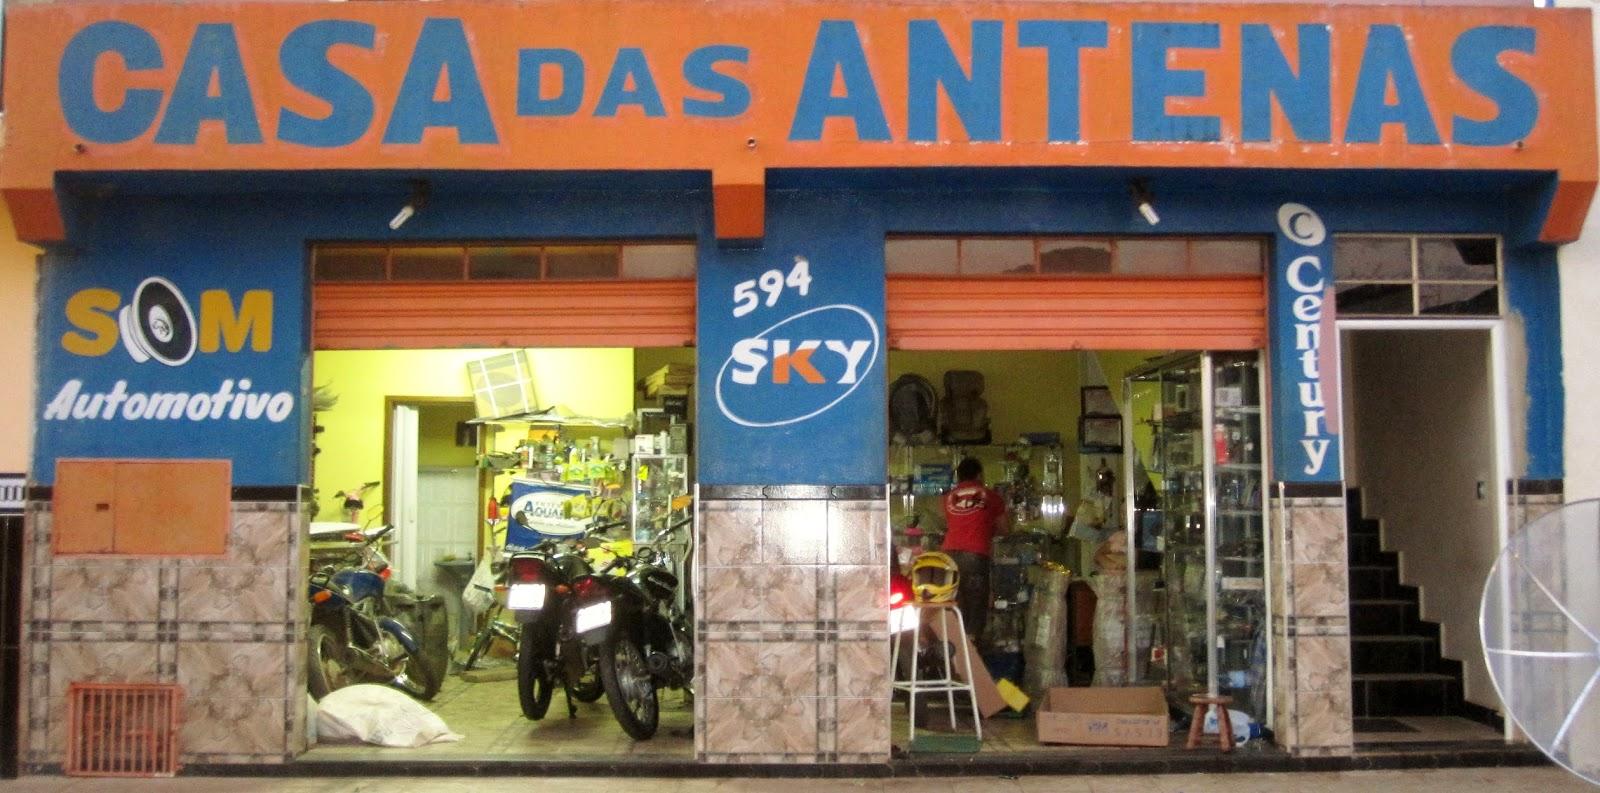 CASA DAS ANTENAS Acácio das Antenas Rua. Cel. Licínio, 594 Centro - Buri - SP tel:(15) 3546-2384